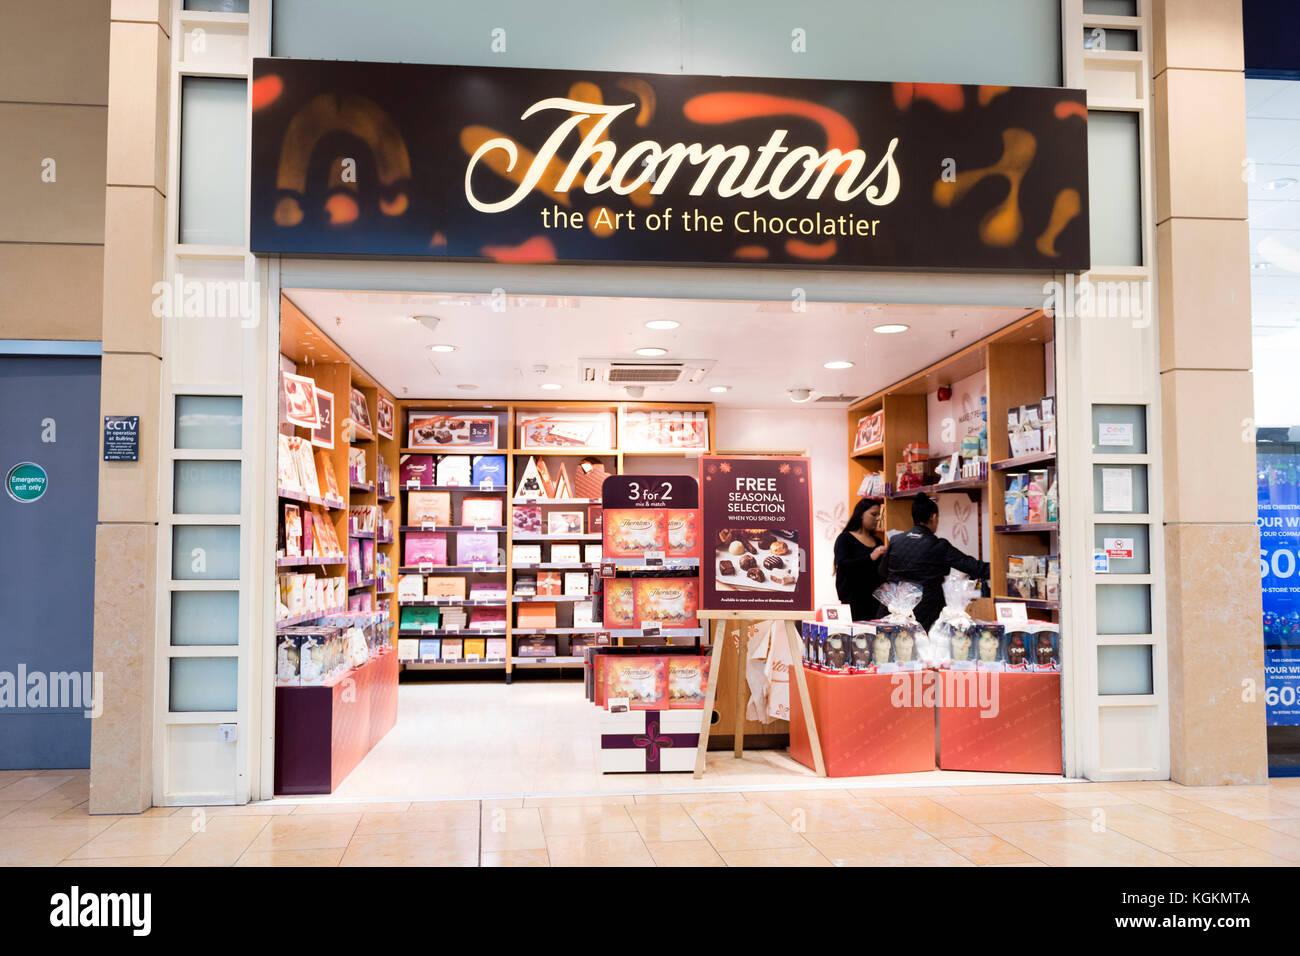 Thorntons chocolatier store, UK. - Stock Image